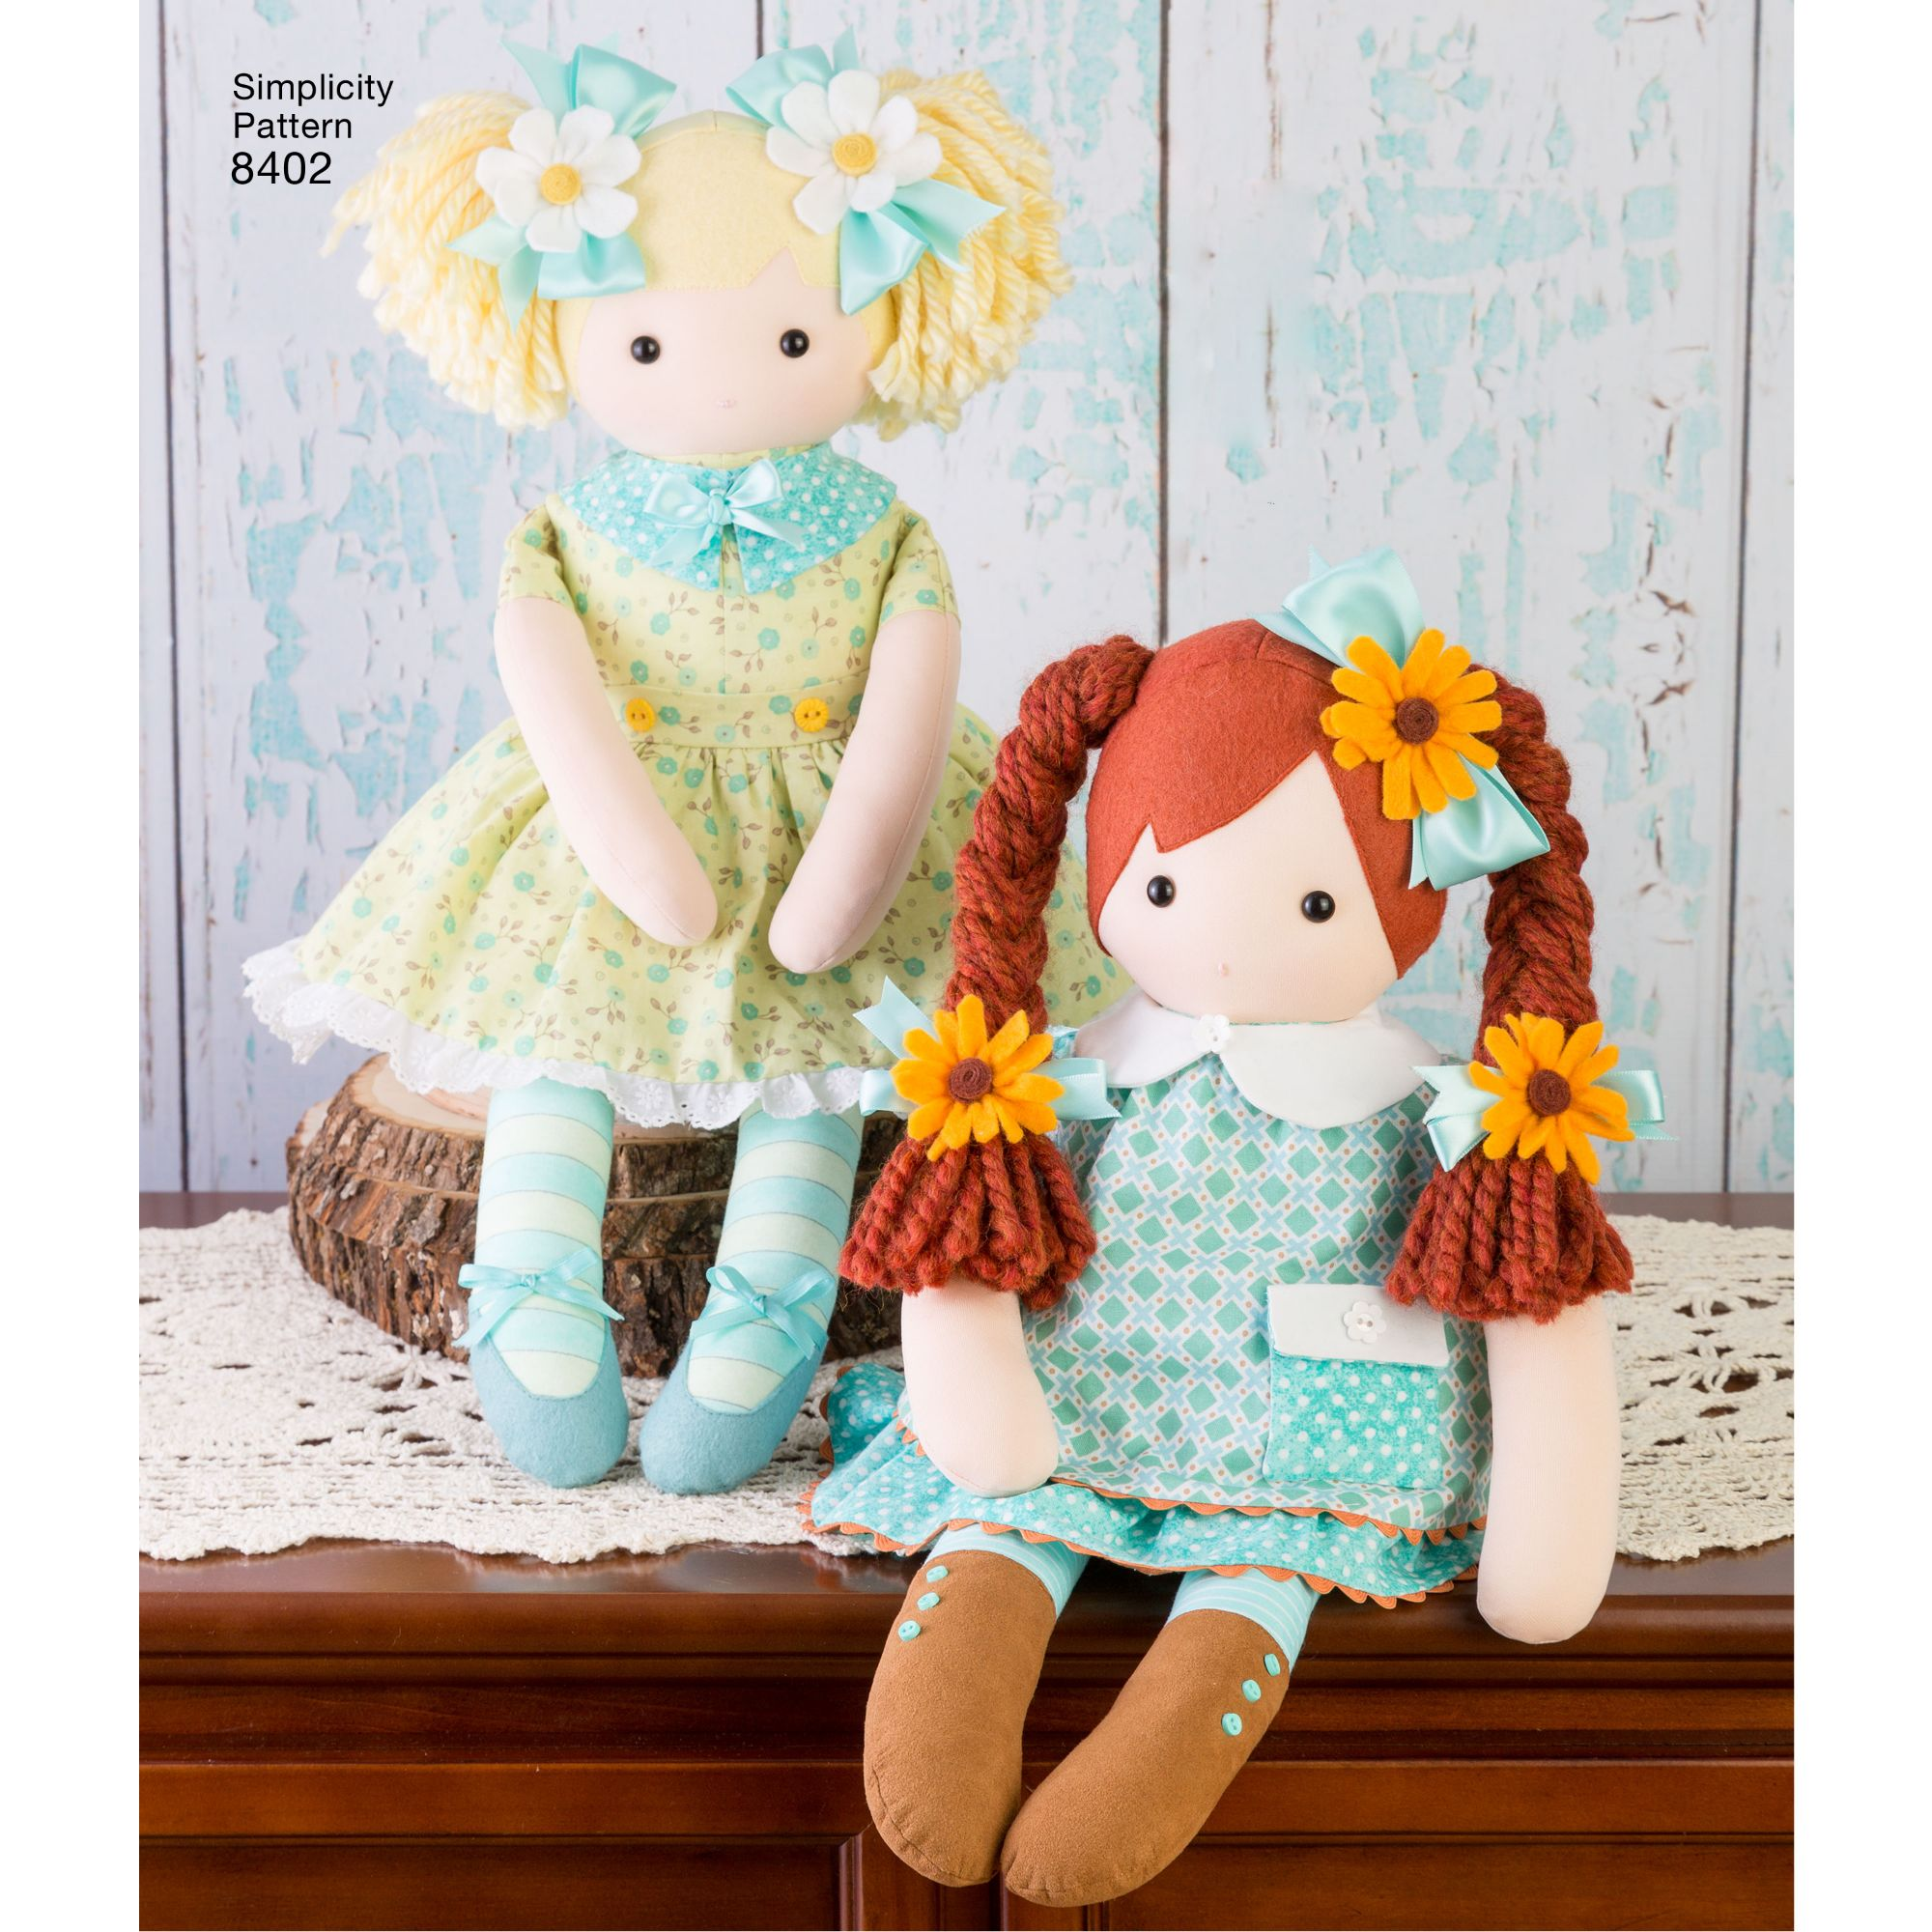 simplicity-stuffed-dolls-pattern-8402-AV5